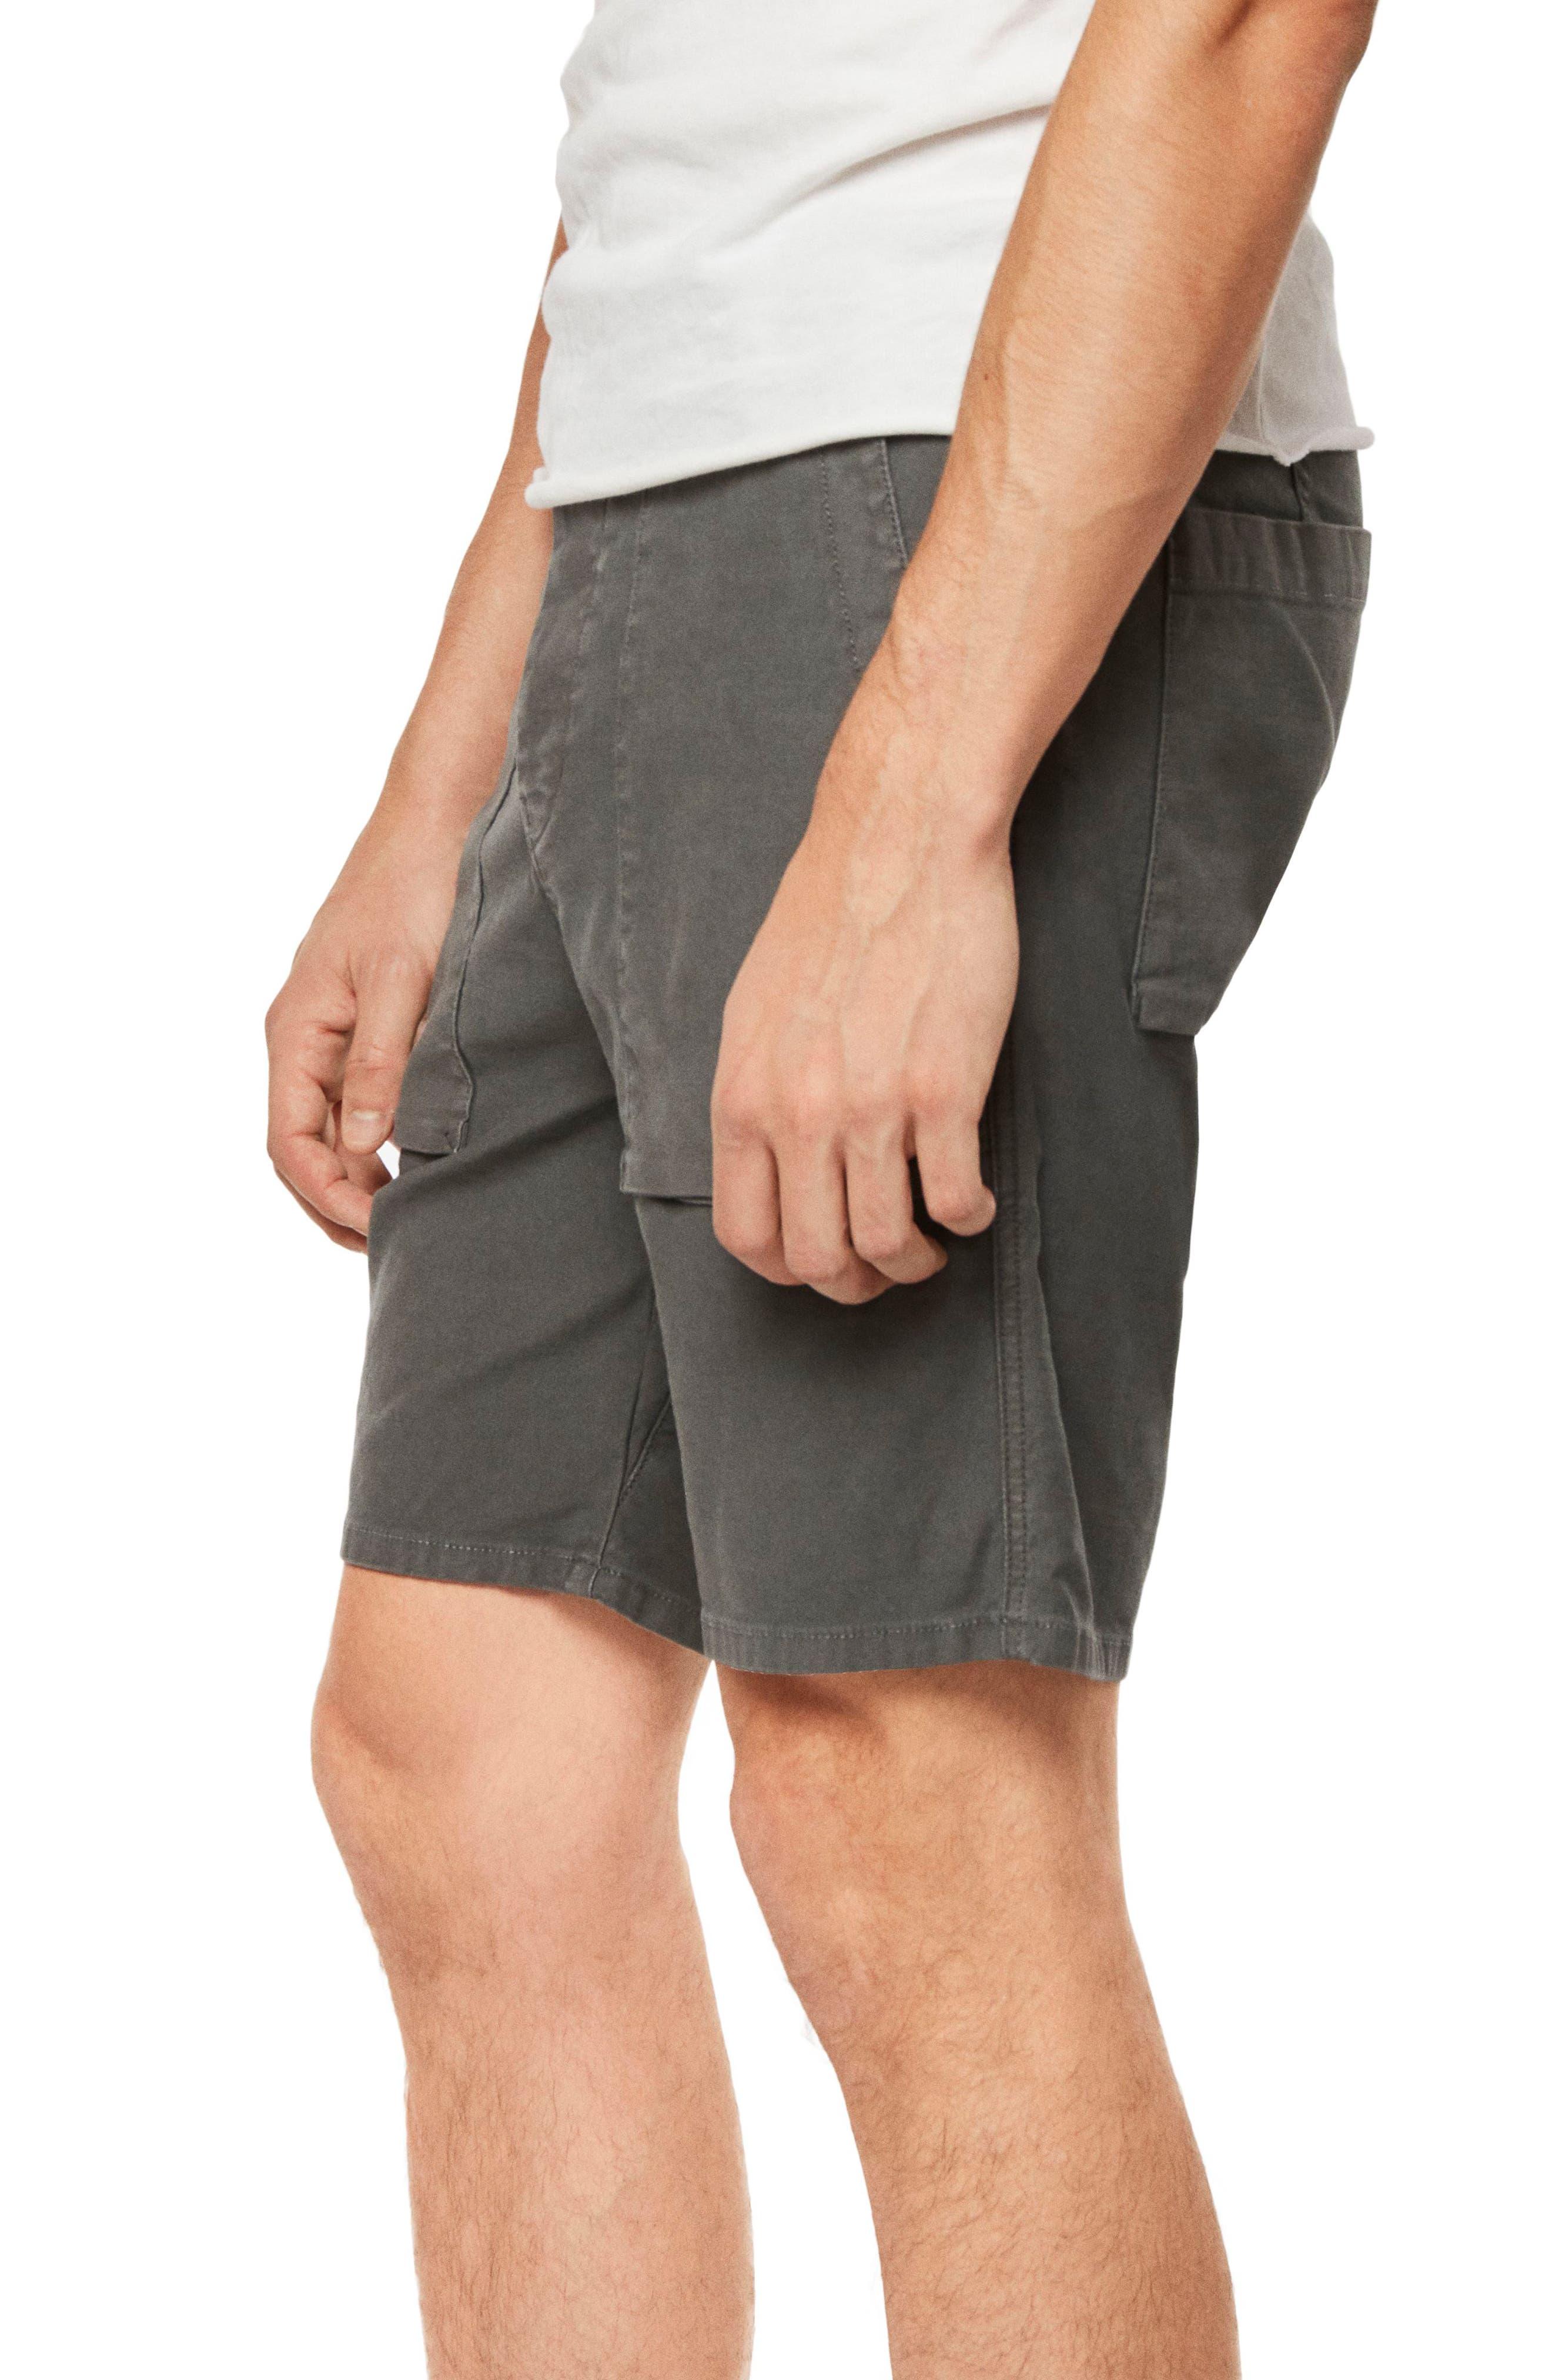 Kontact Shorts,                             Alternate thumbnail 3, color,                             308